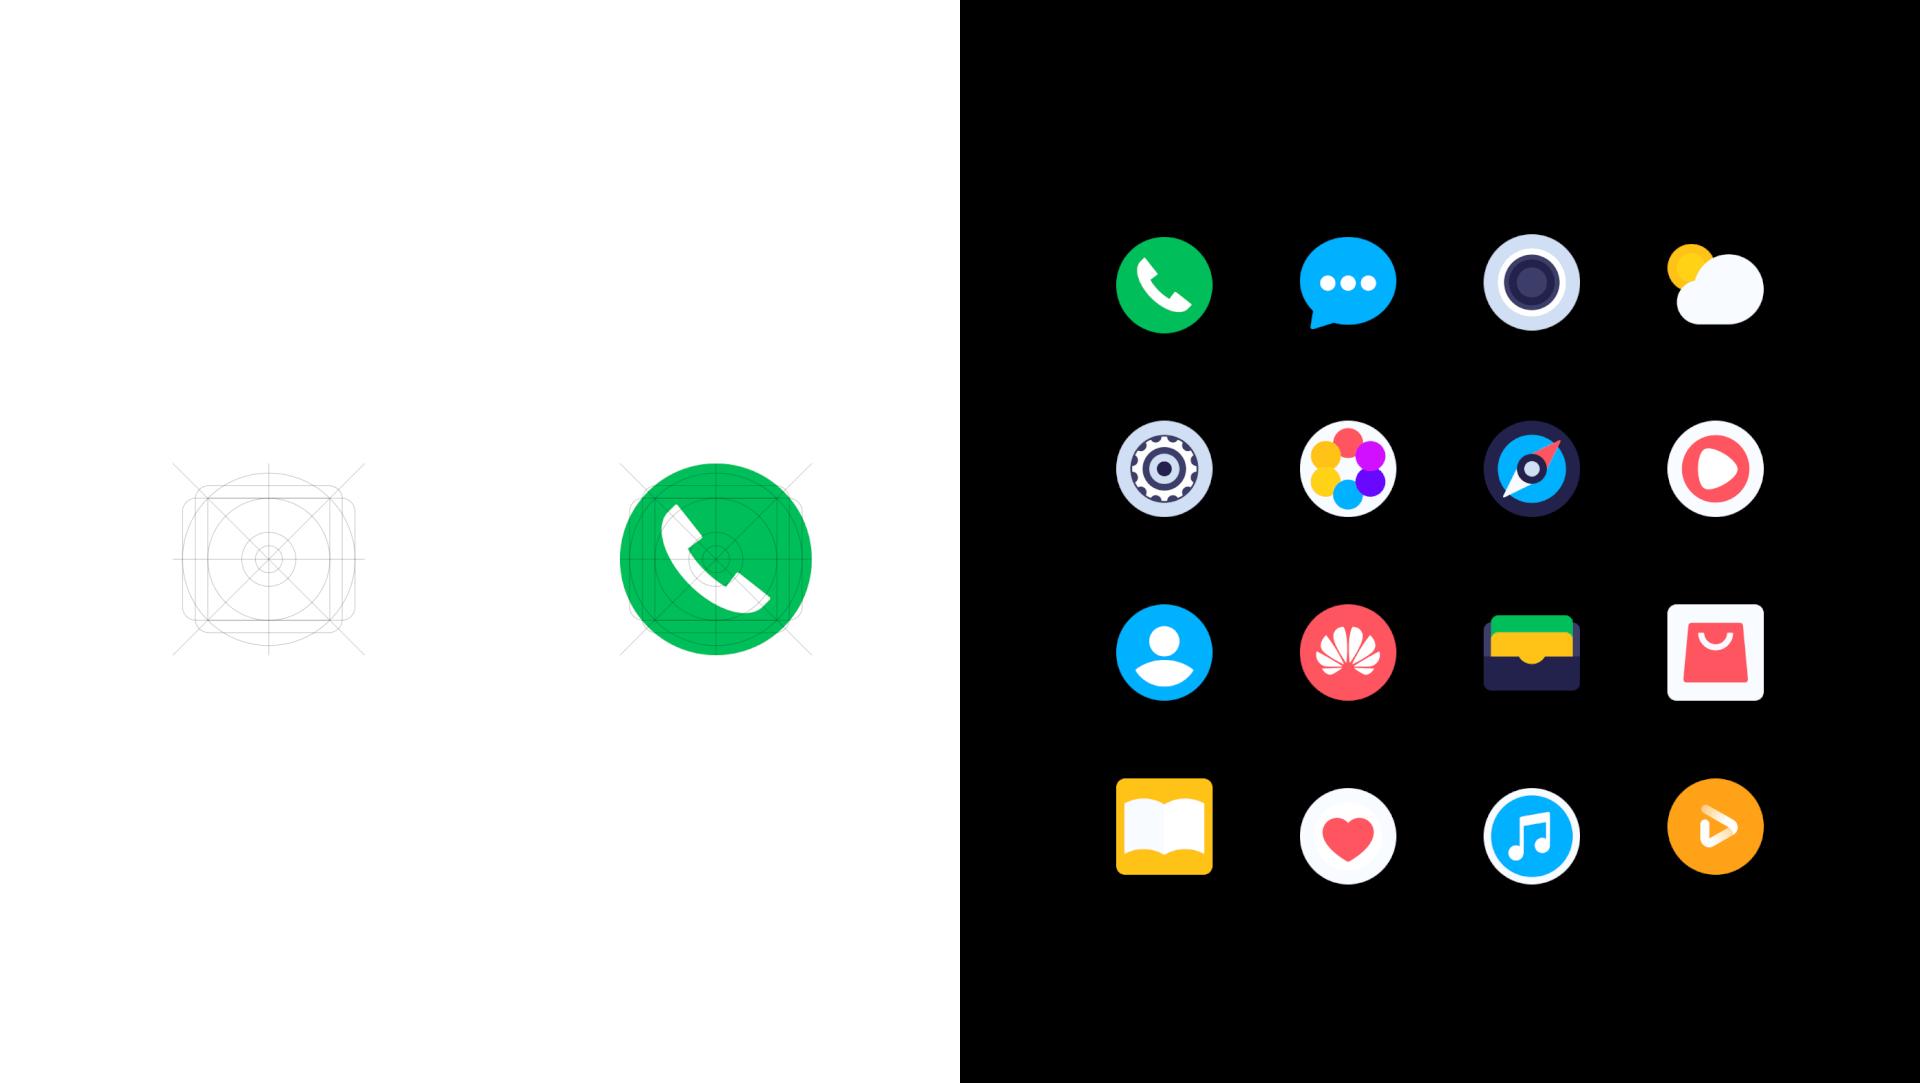 HUAWEI_EMUI_icons_tubik phone icon